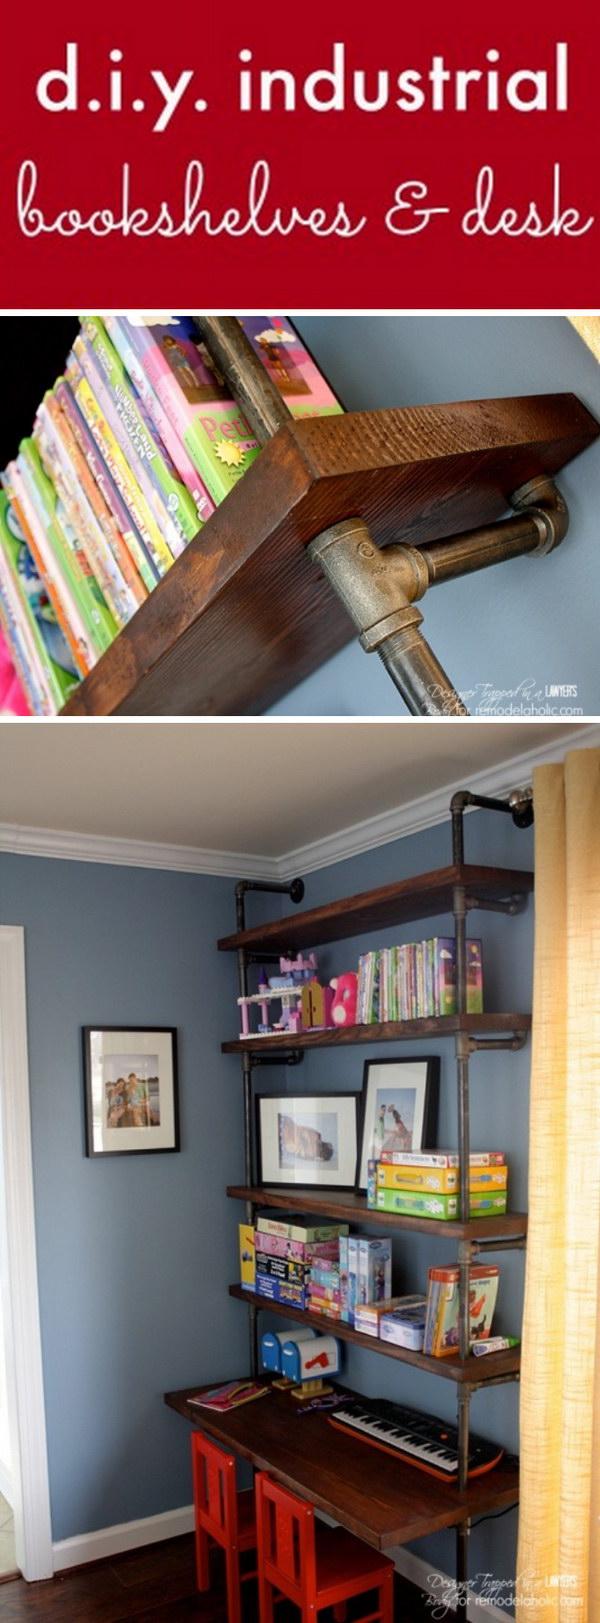 DIY Industrial Pipe Shelves and Desk.